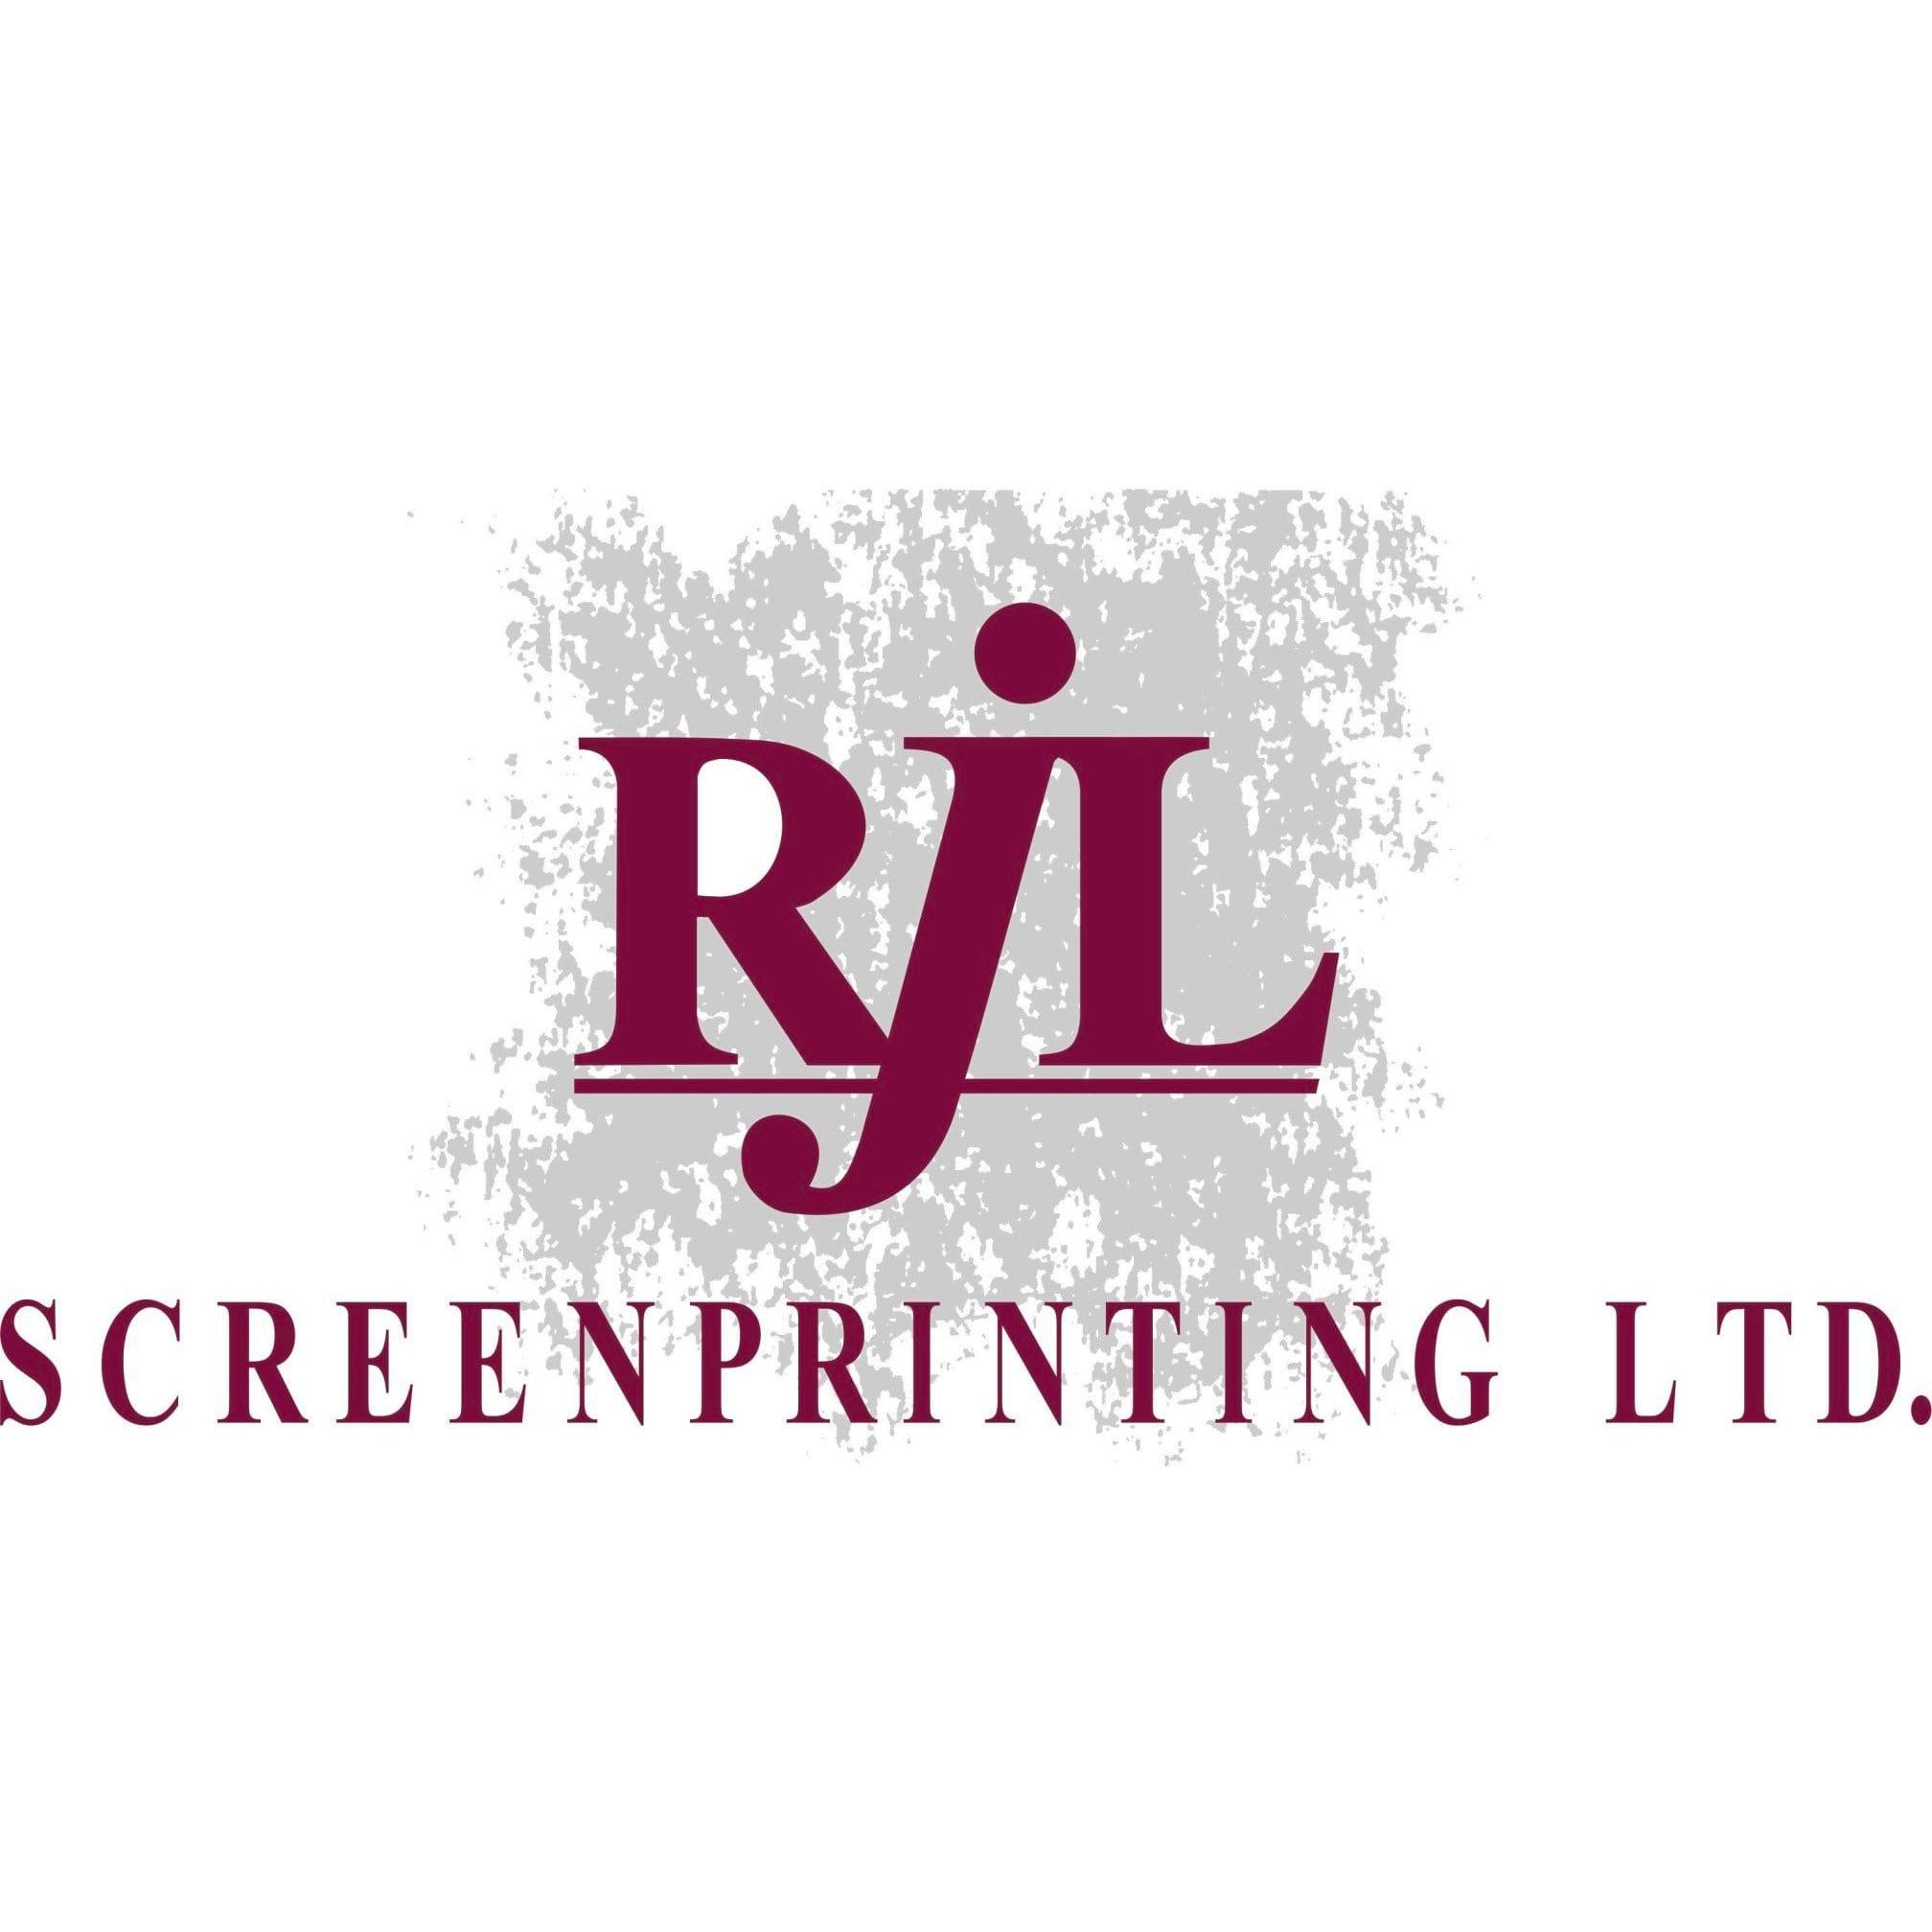 R J L Screen Printing Ltd - Portsmouth, Hampshire PO6 4QE - 02392 326600   ShowMeLocal.com